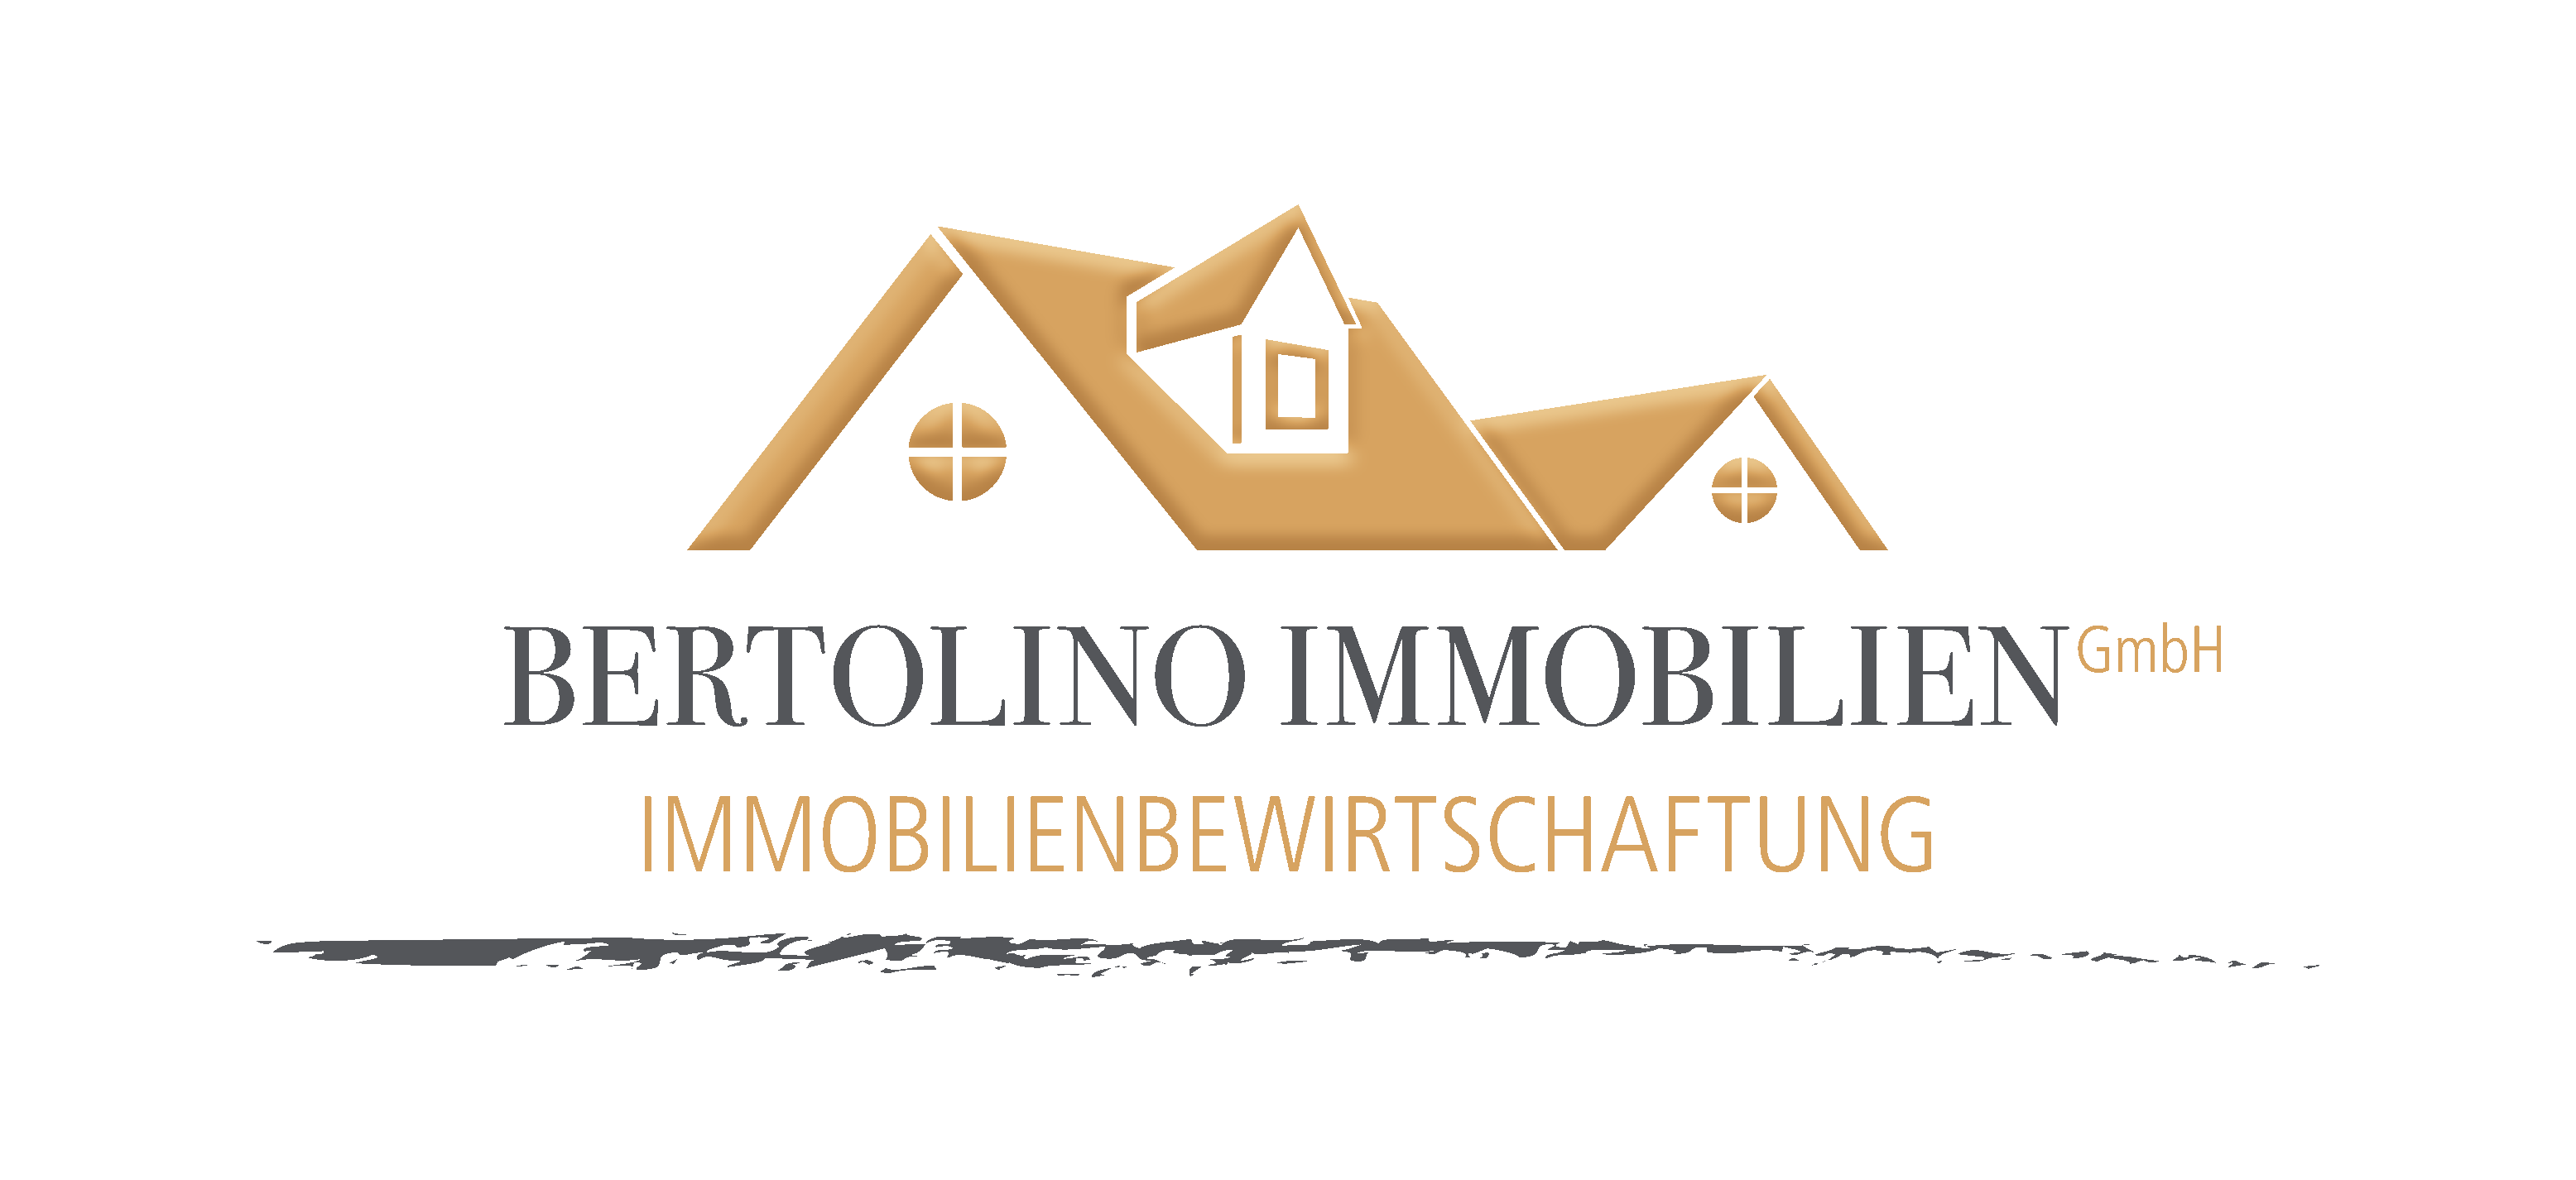 Bertolino Immobilien GmbH Logo